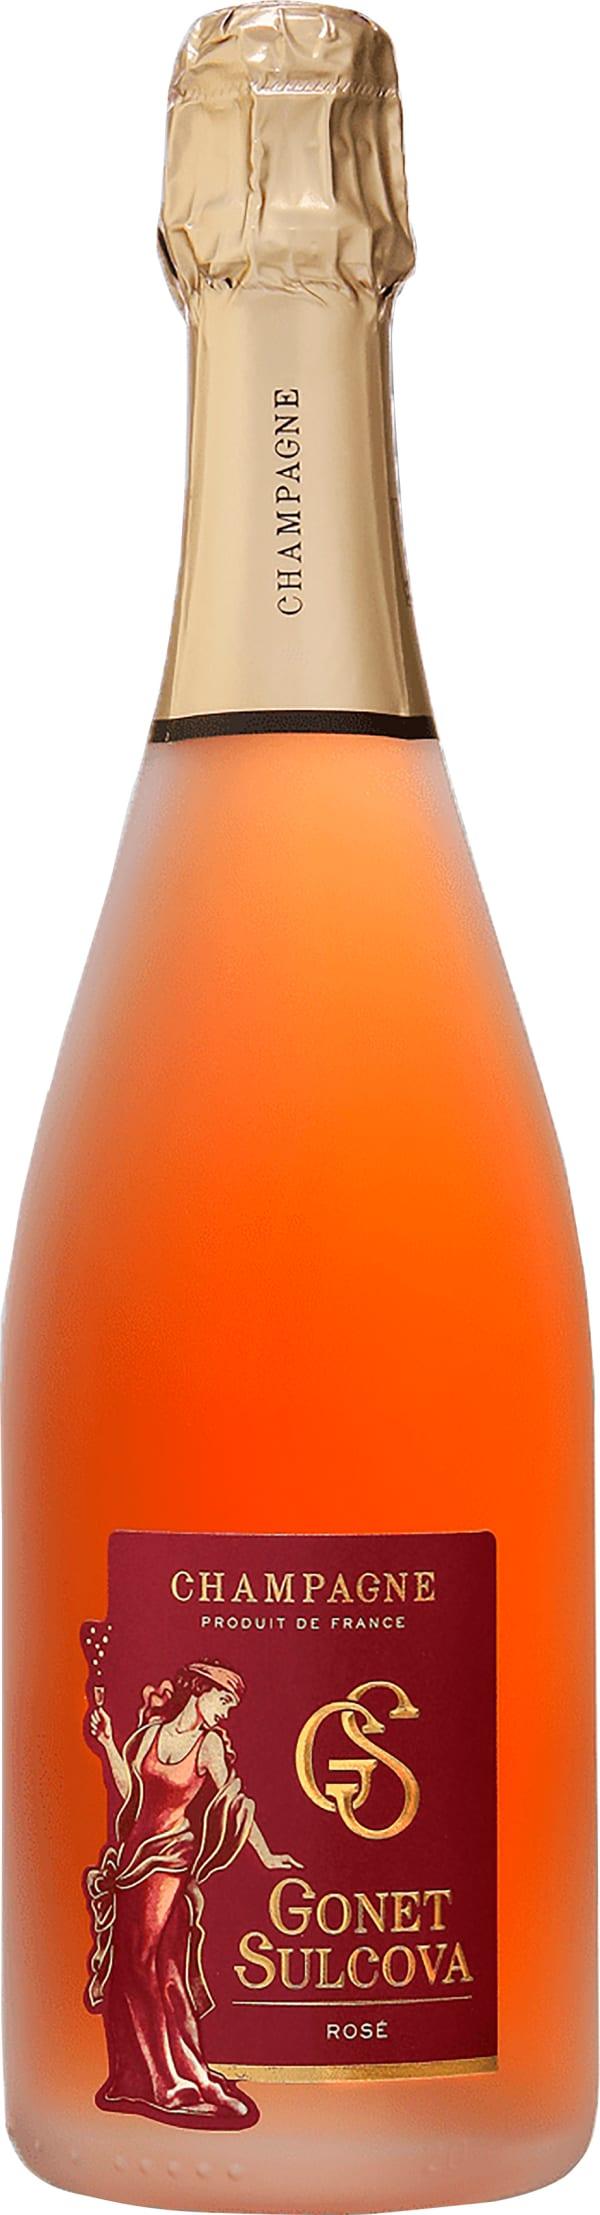 Gonet Sulcova Rose Champagne Sec